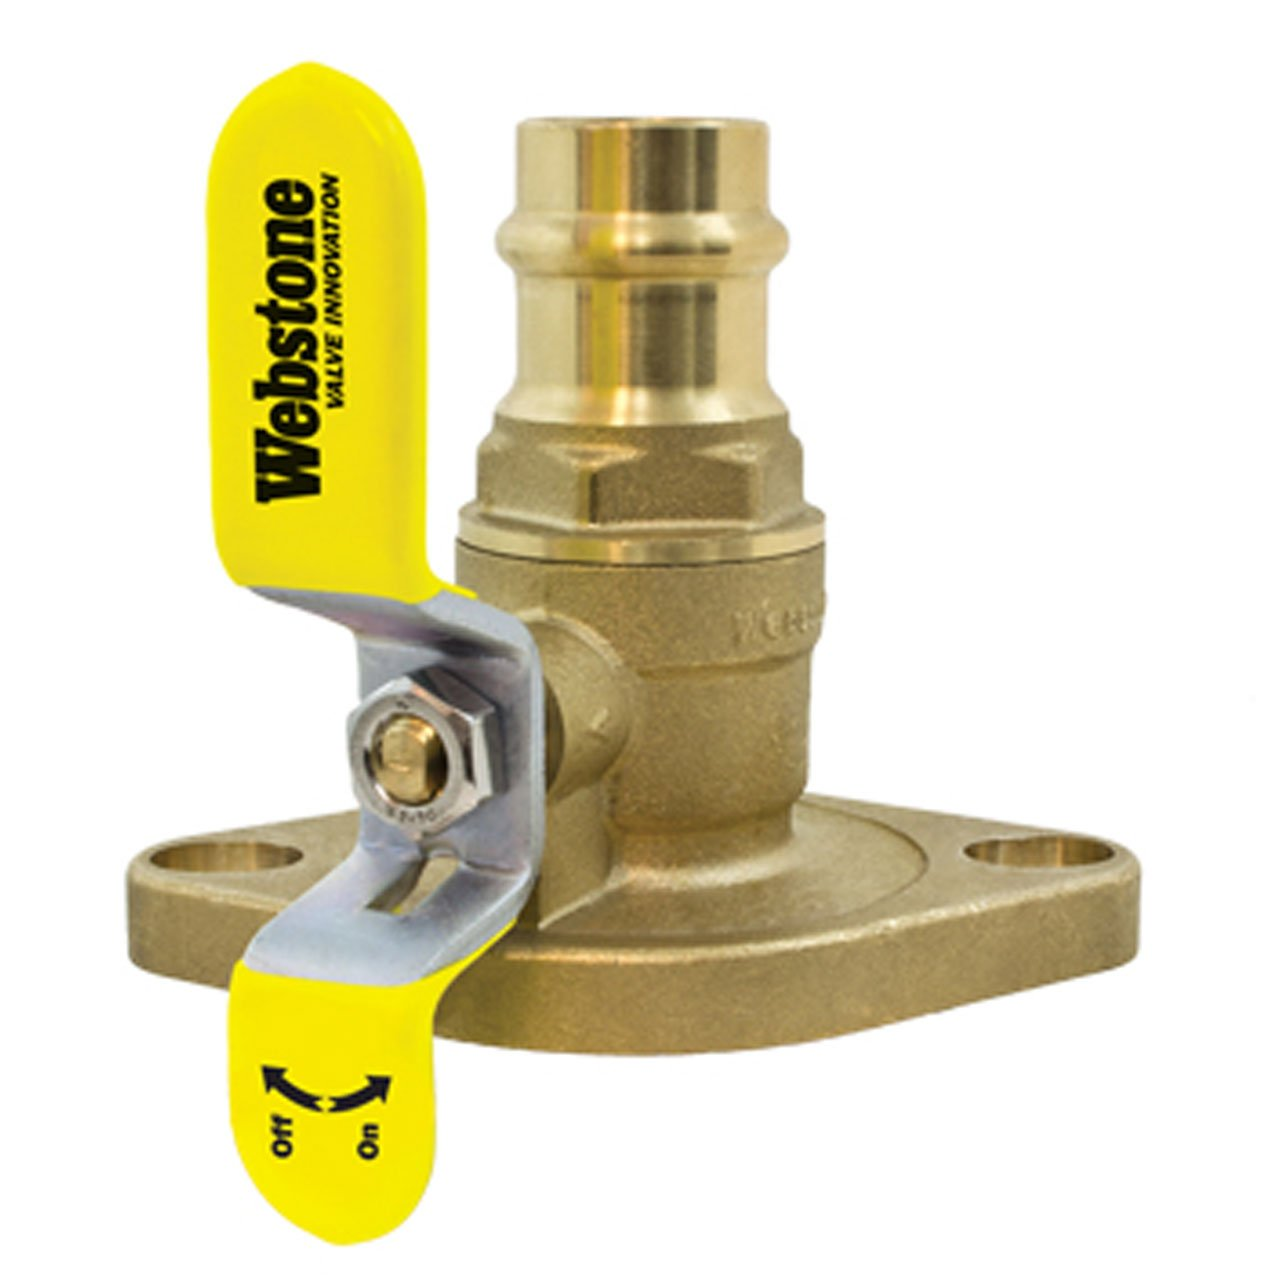 Webstone 81406HV Full Port 1 1/2-Inch Press x Flange Isolator with Rotating Flange